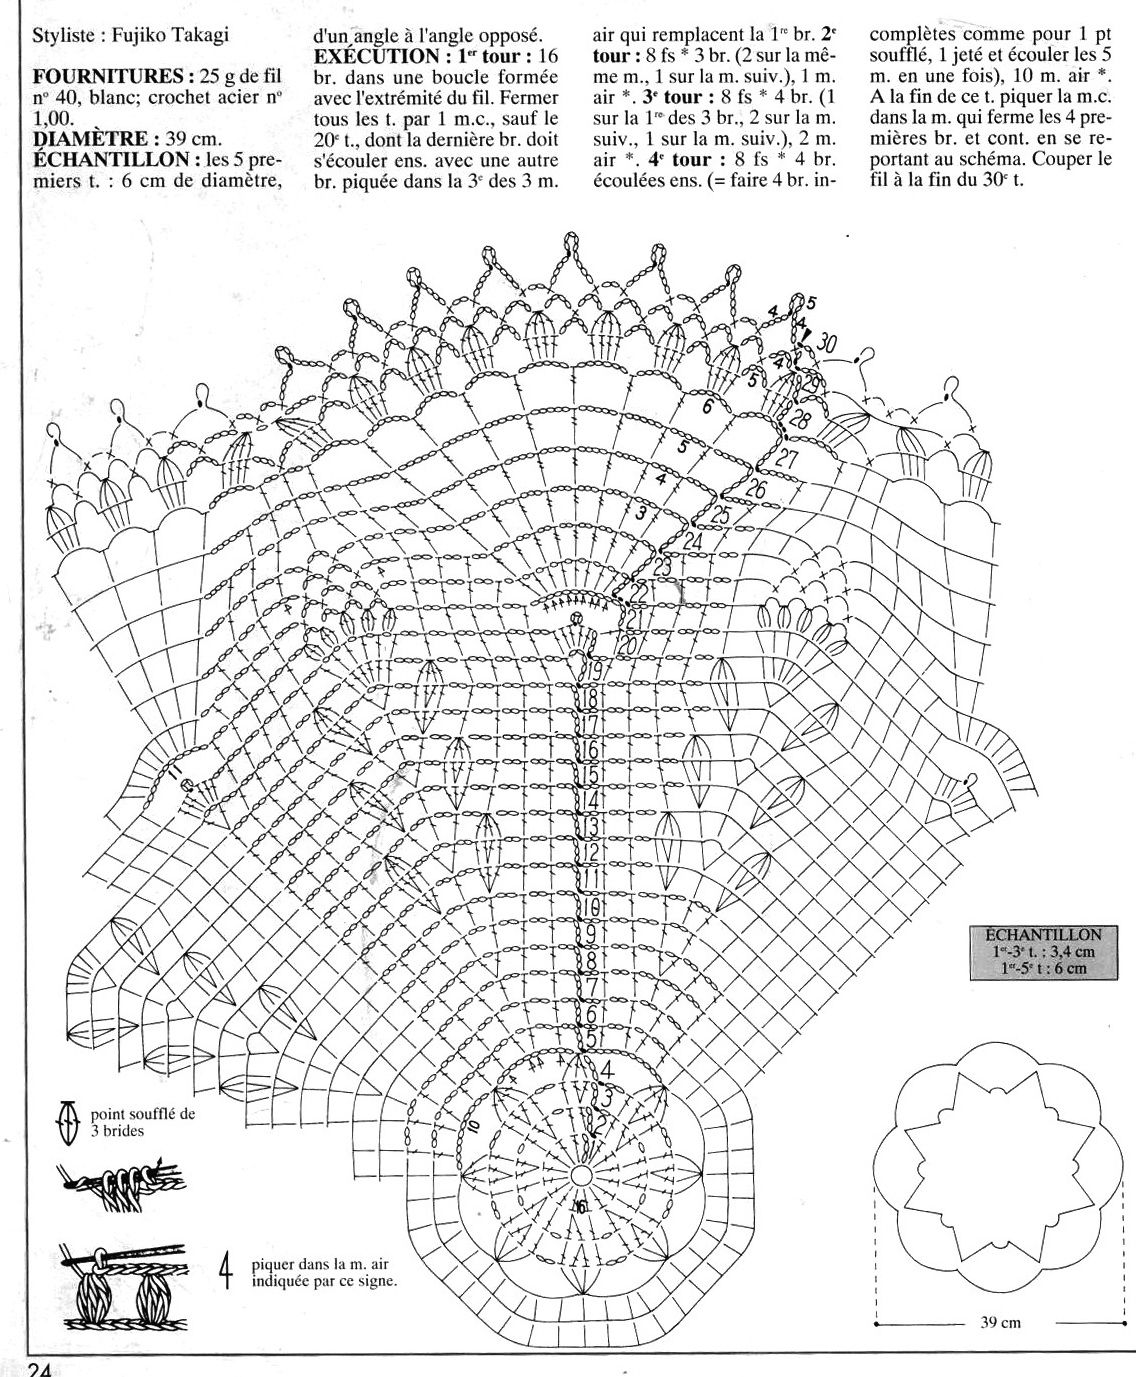 13 Blondas Pinterest Crochet Doilies And Doily Diagram Patrones 2 Patterns Pin Patternscrochet Chartcrochet